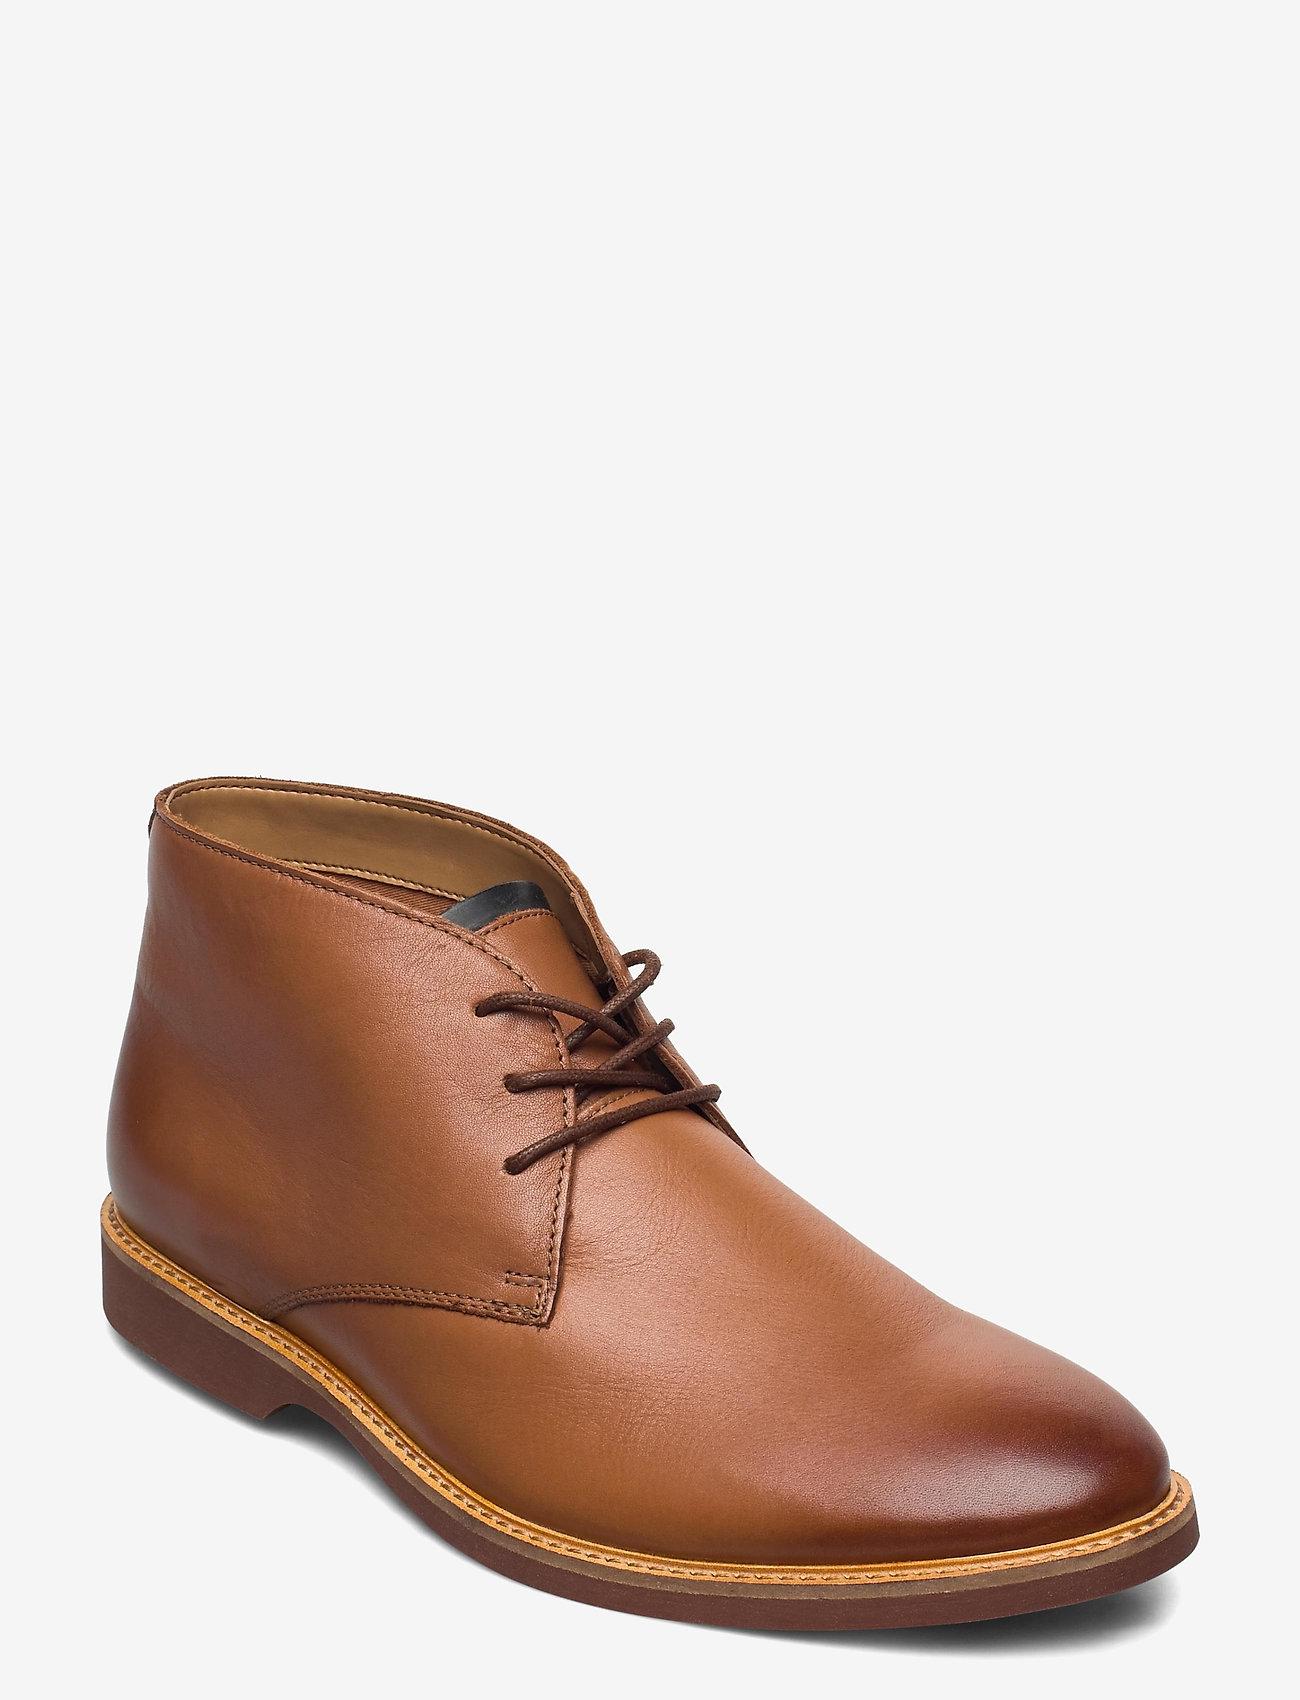 Clarks - Atticus Limit - desert boots - tan leather - 0